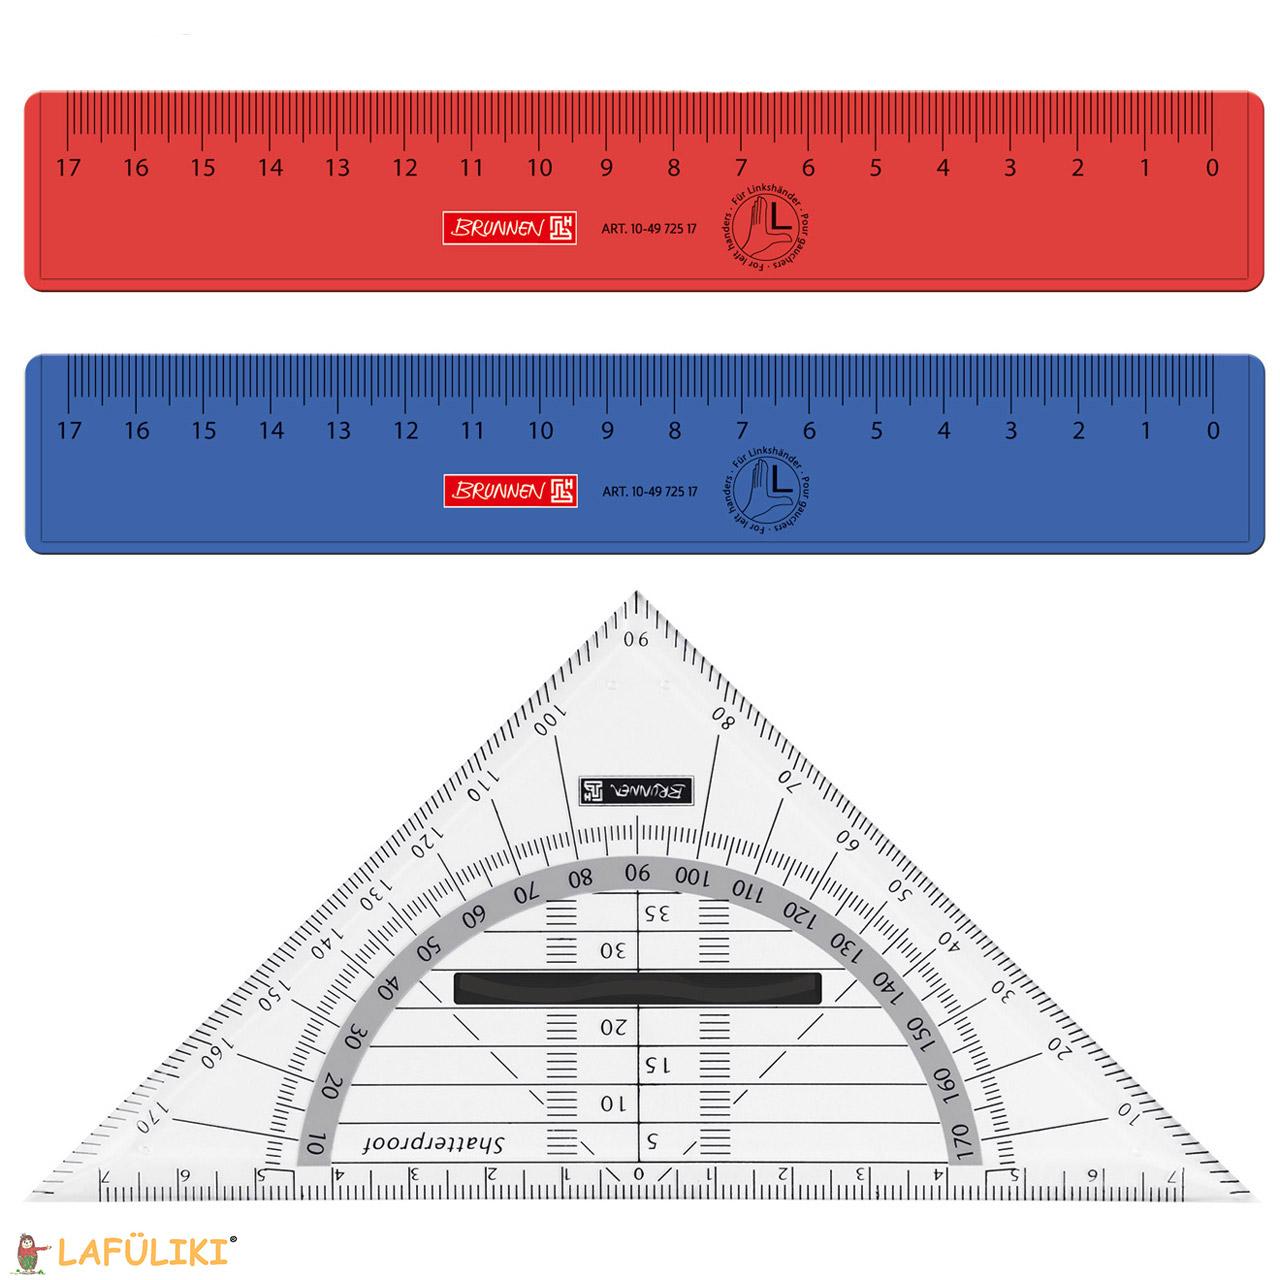 abheftbar Farbe Geometriedreieck rot biegsames Geo-Dreieck